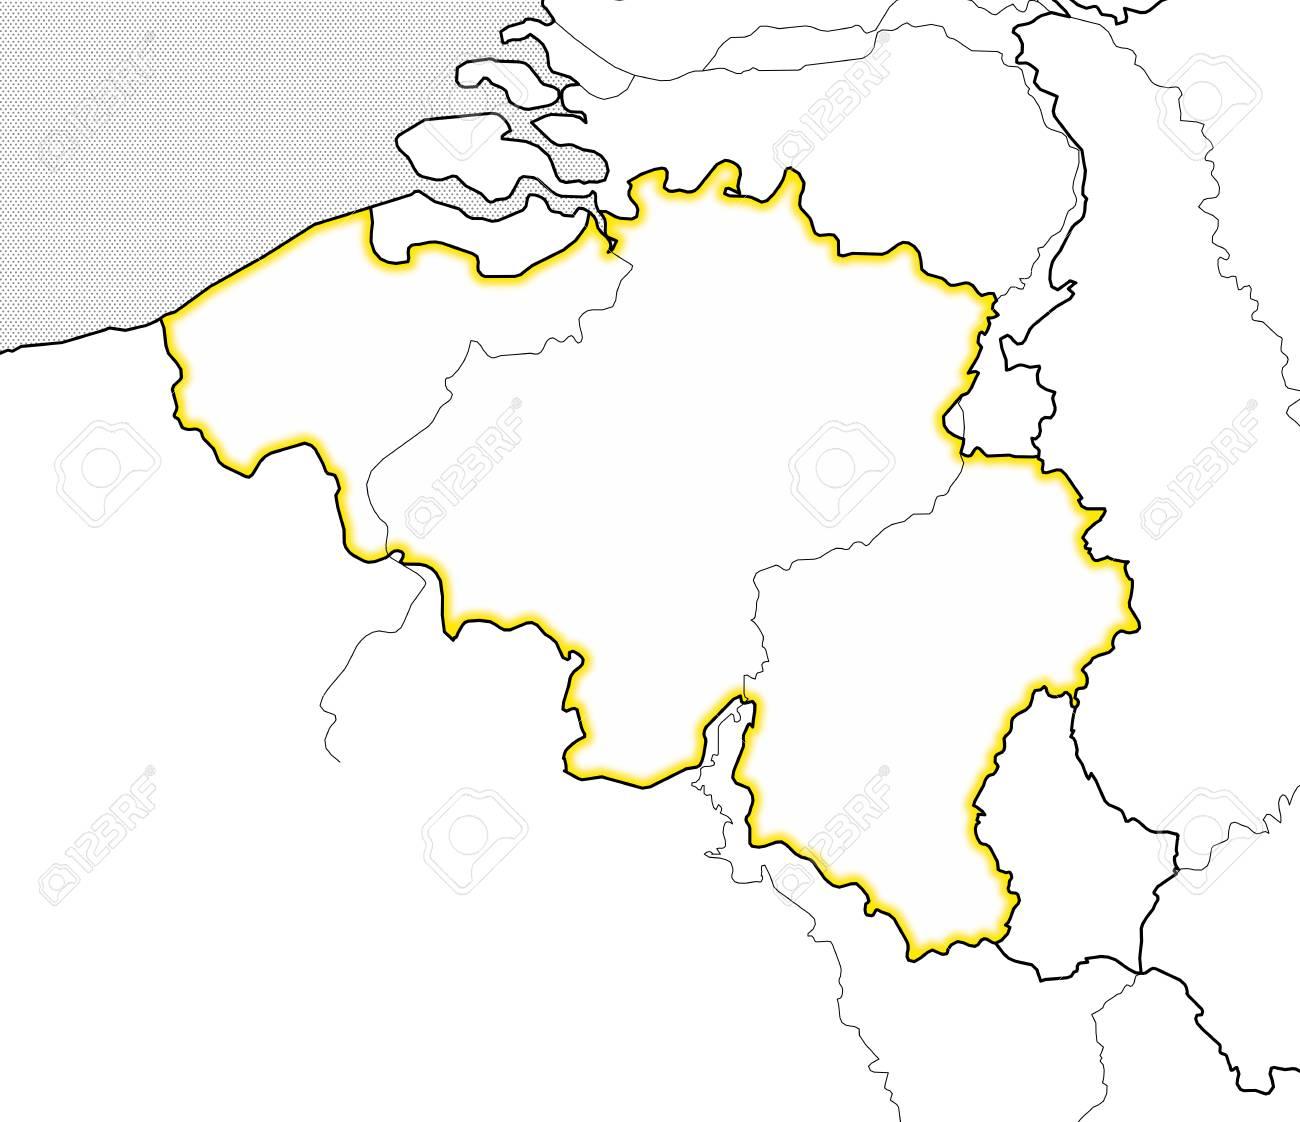 Belgien Karte Umriss.Stock Photo